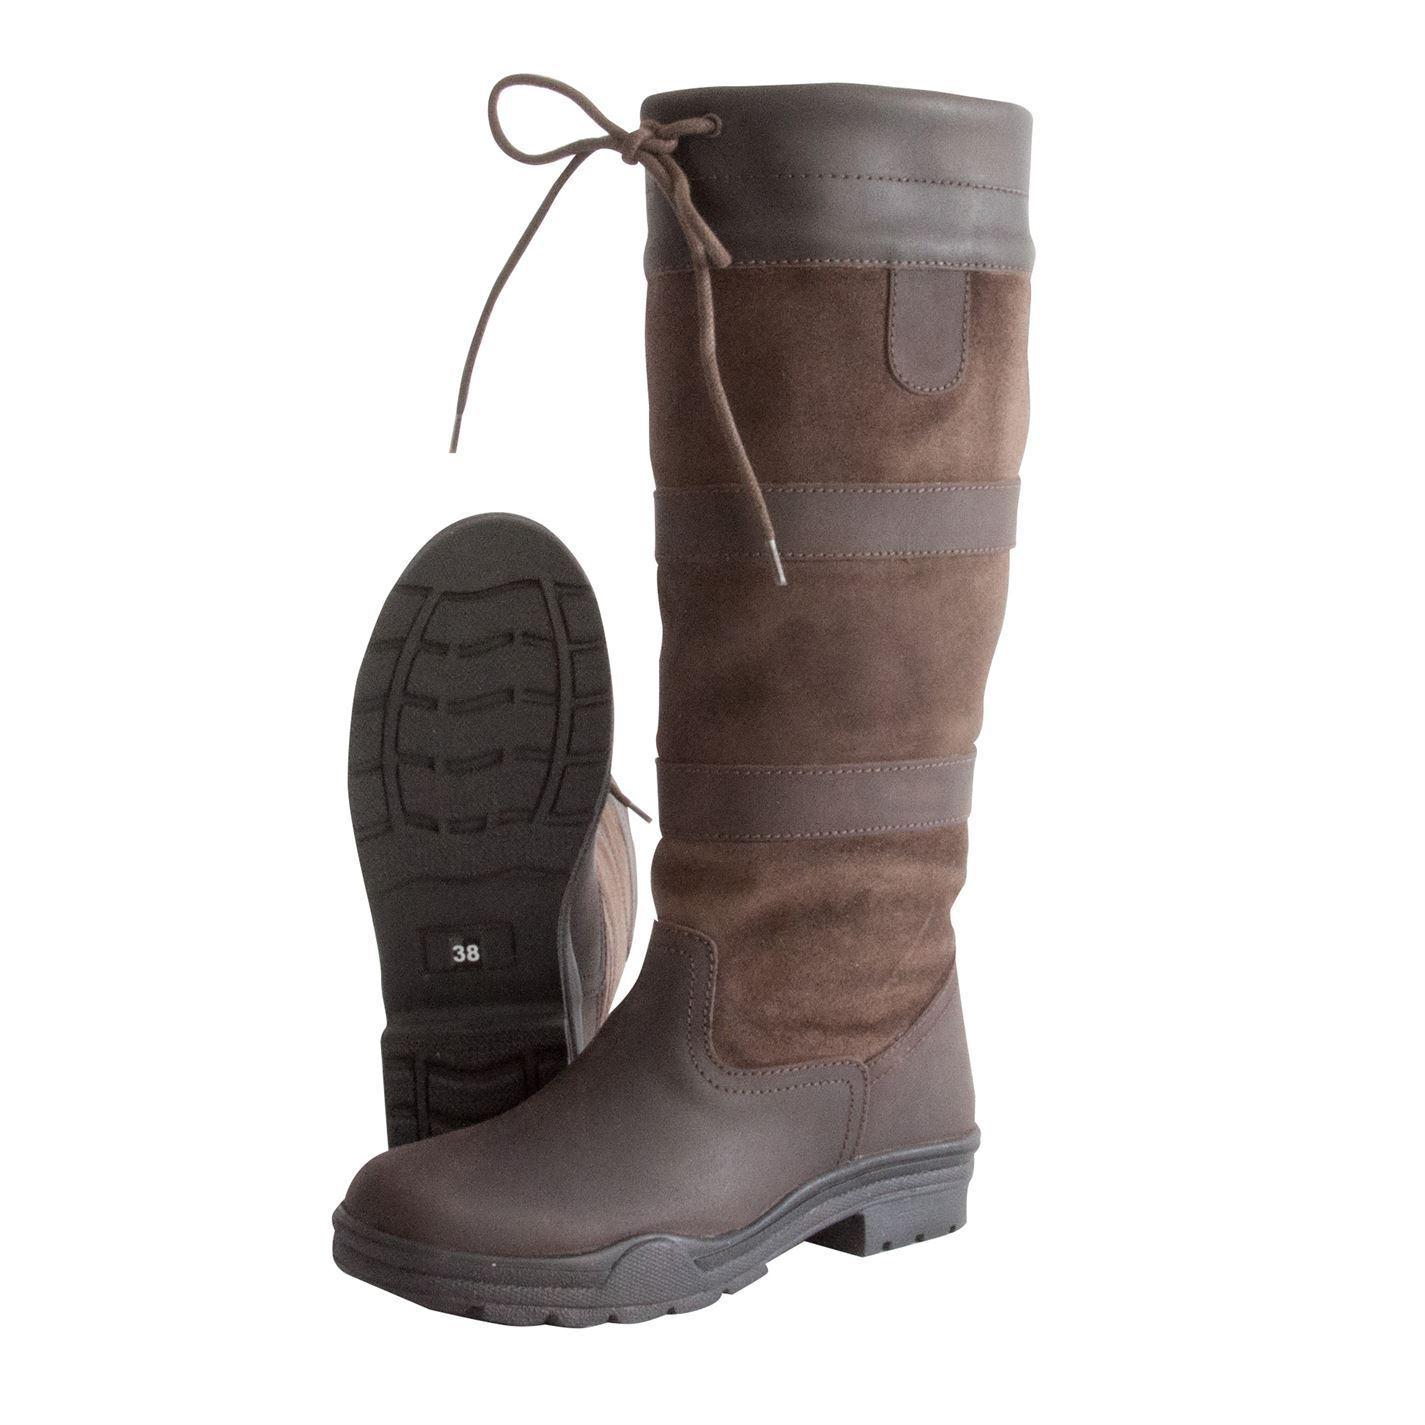 Botas para mujer Granger necesarias Damas Cordones Botas De Montar Cordones Damas país 4-8 27dc50